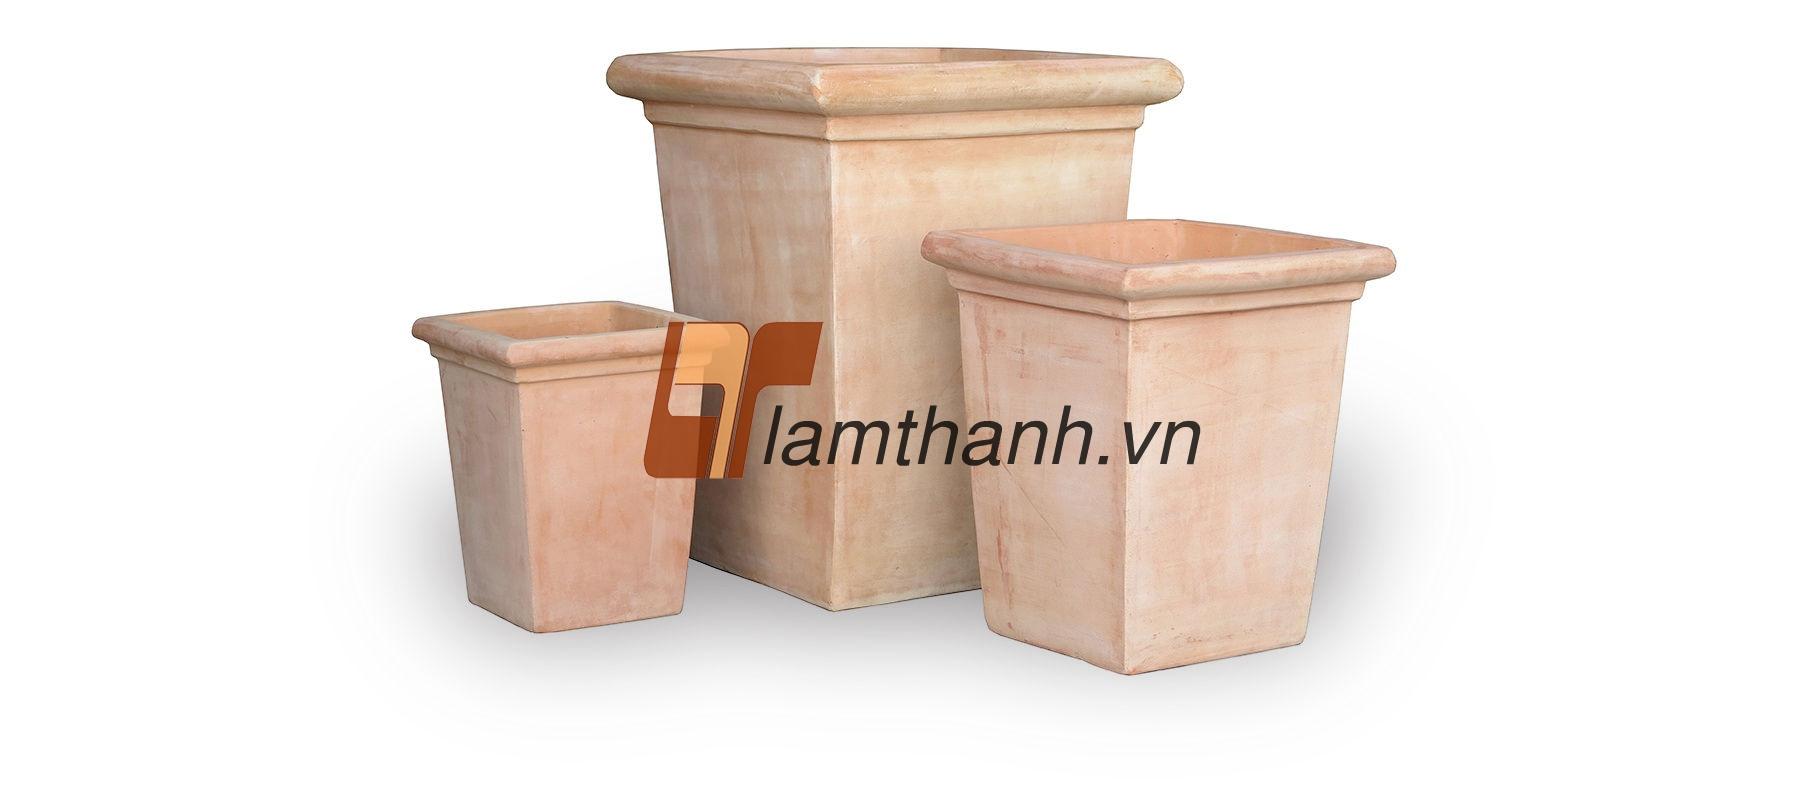 vietnam terracotta, pottery 10